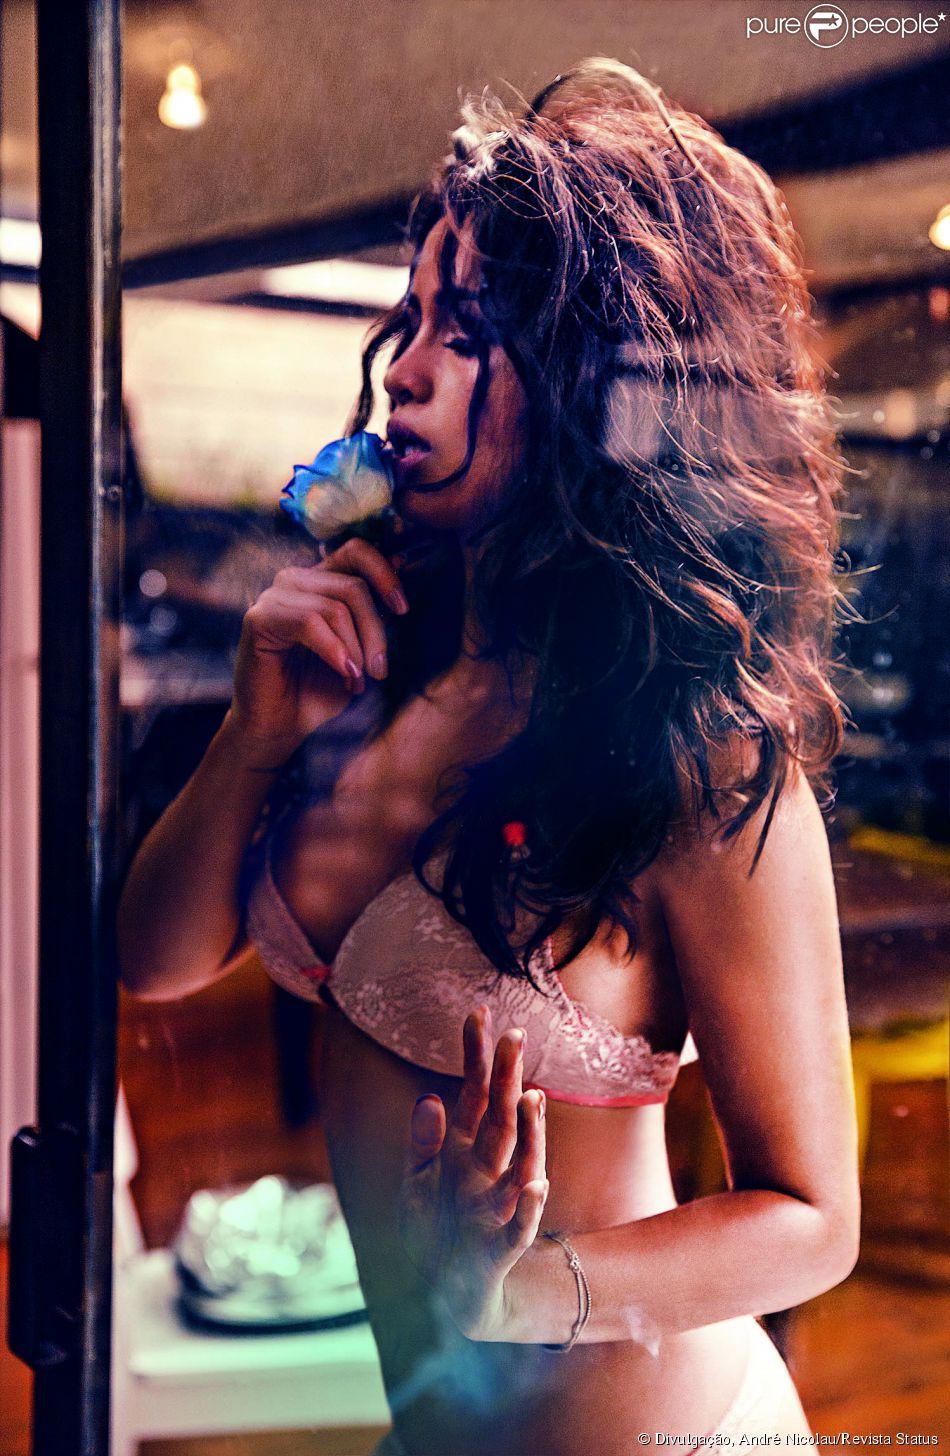 http://static1.purepeople.com.br/articles/6/55/41/6/@/749890-nanda-costa-posa-de-lingerie-para-a-950x0-2.jpg